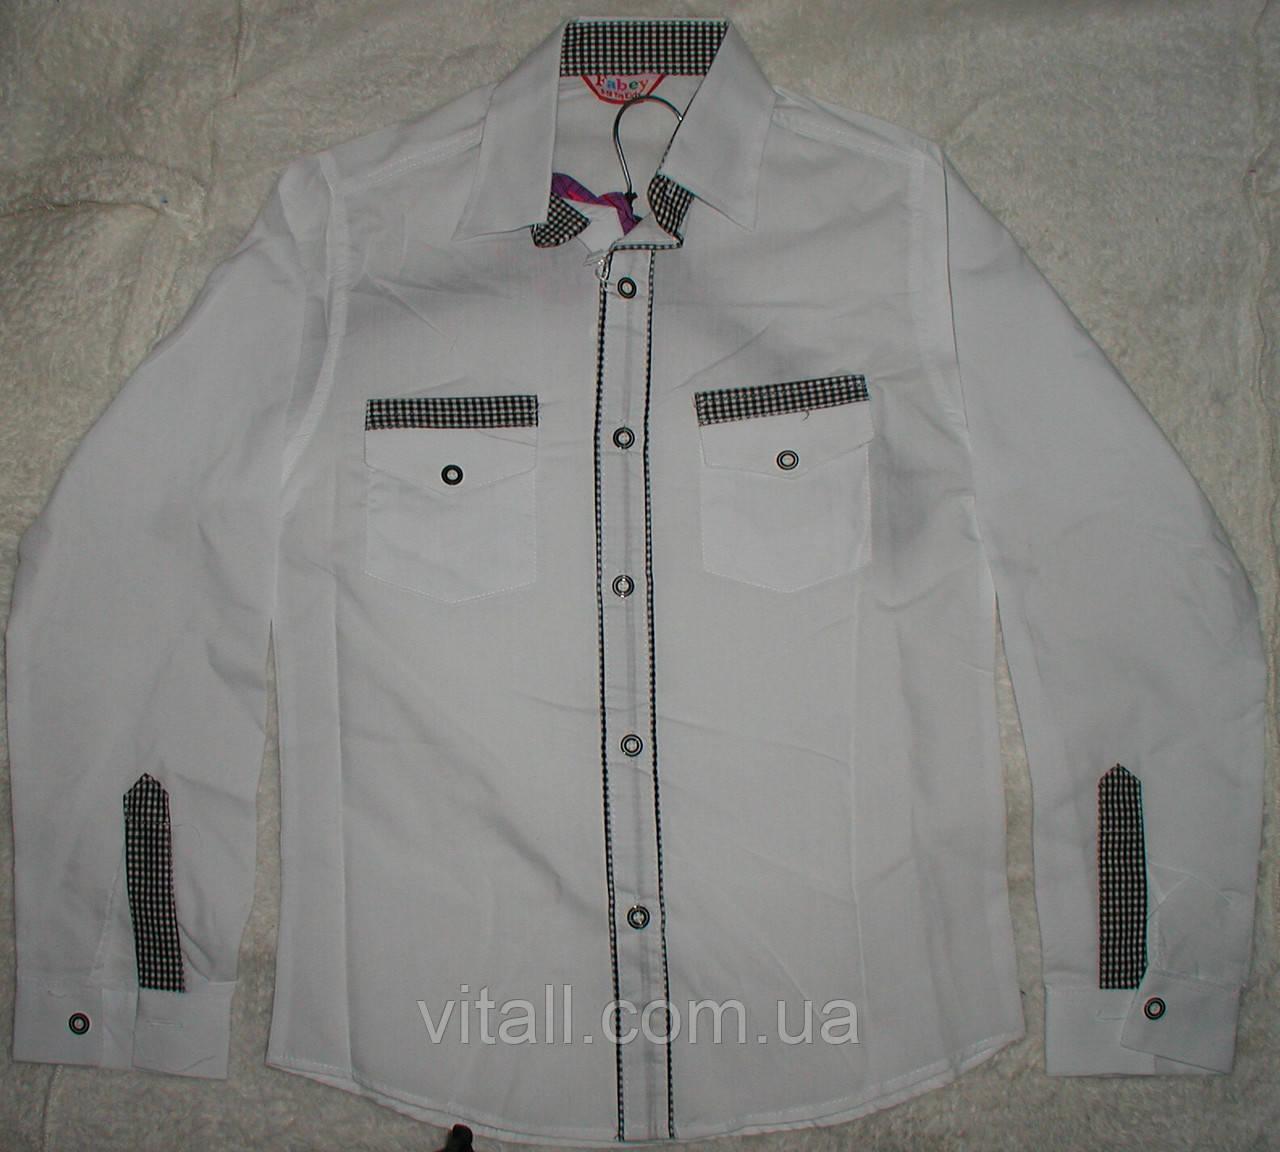 db6b66e20ac Рубашка белая со вставками от 10 до 13 лет - Интернет-магазин одежды Vitall  Production